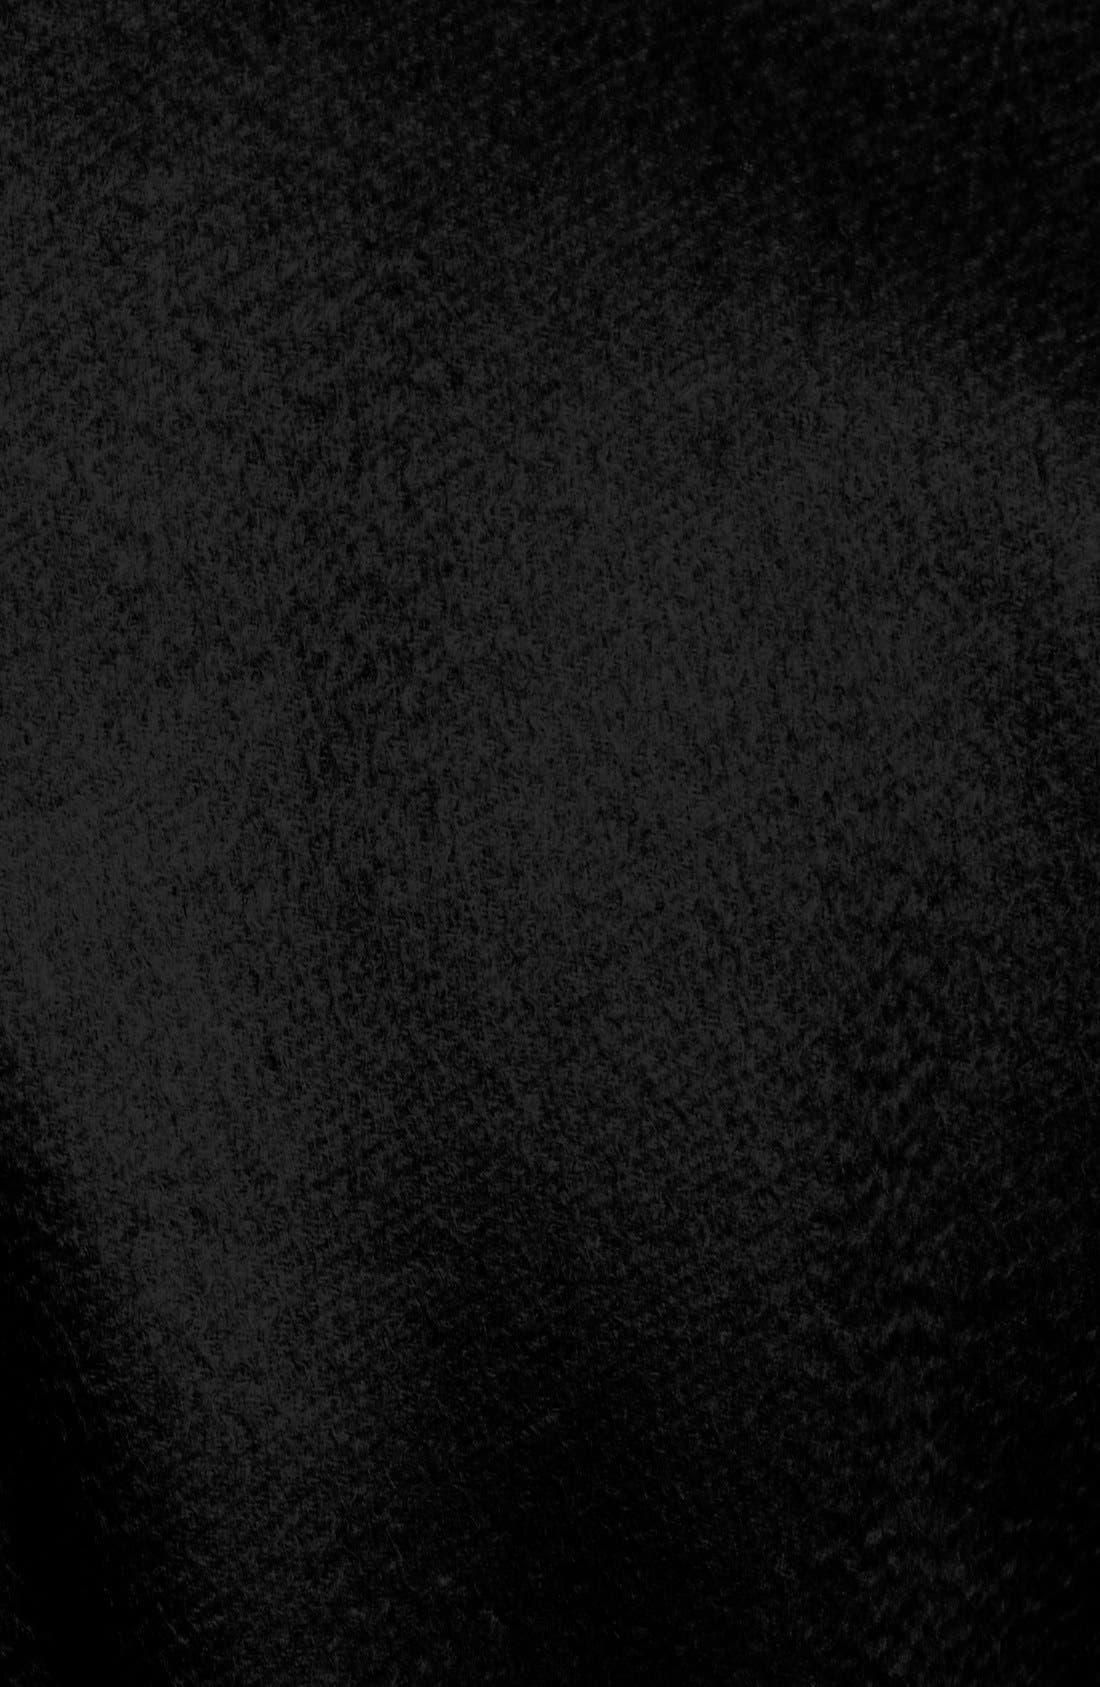 MAX MARA,                             'Lilia' Belted Cashmere Coat,                             Alternate thumbnail 4, color,                             001